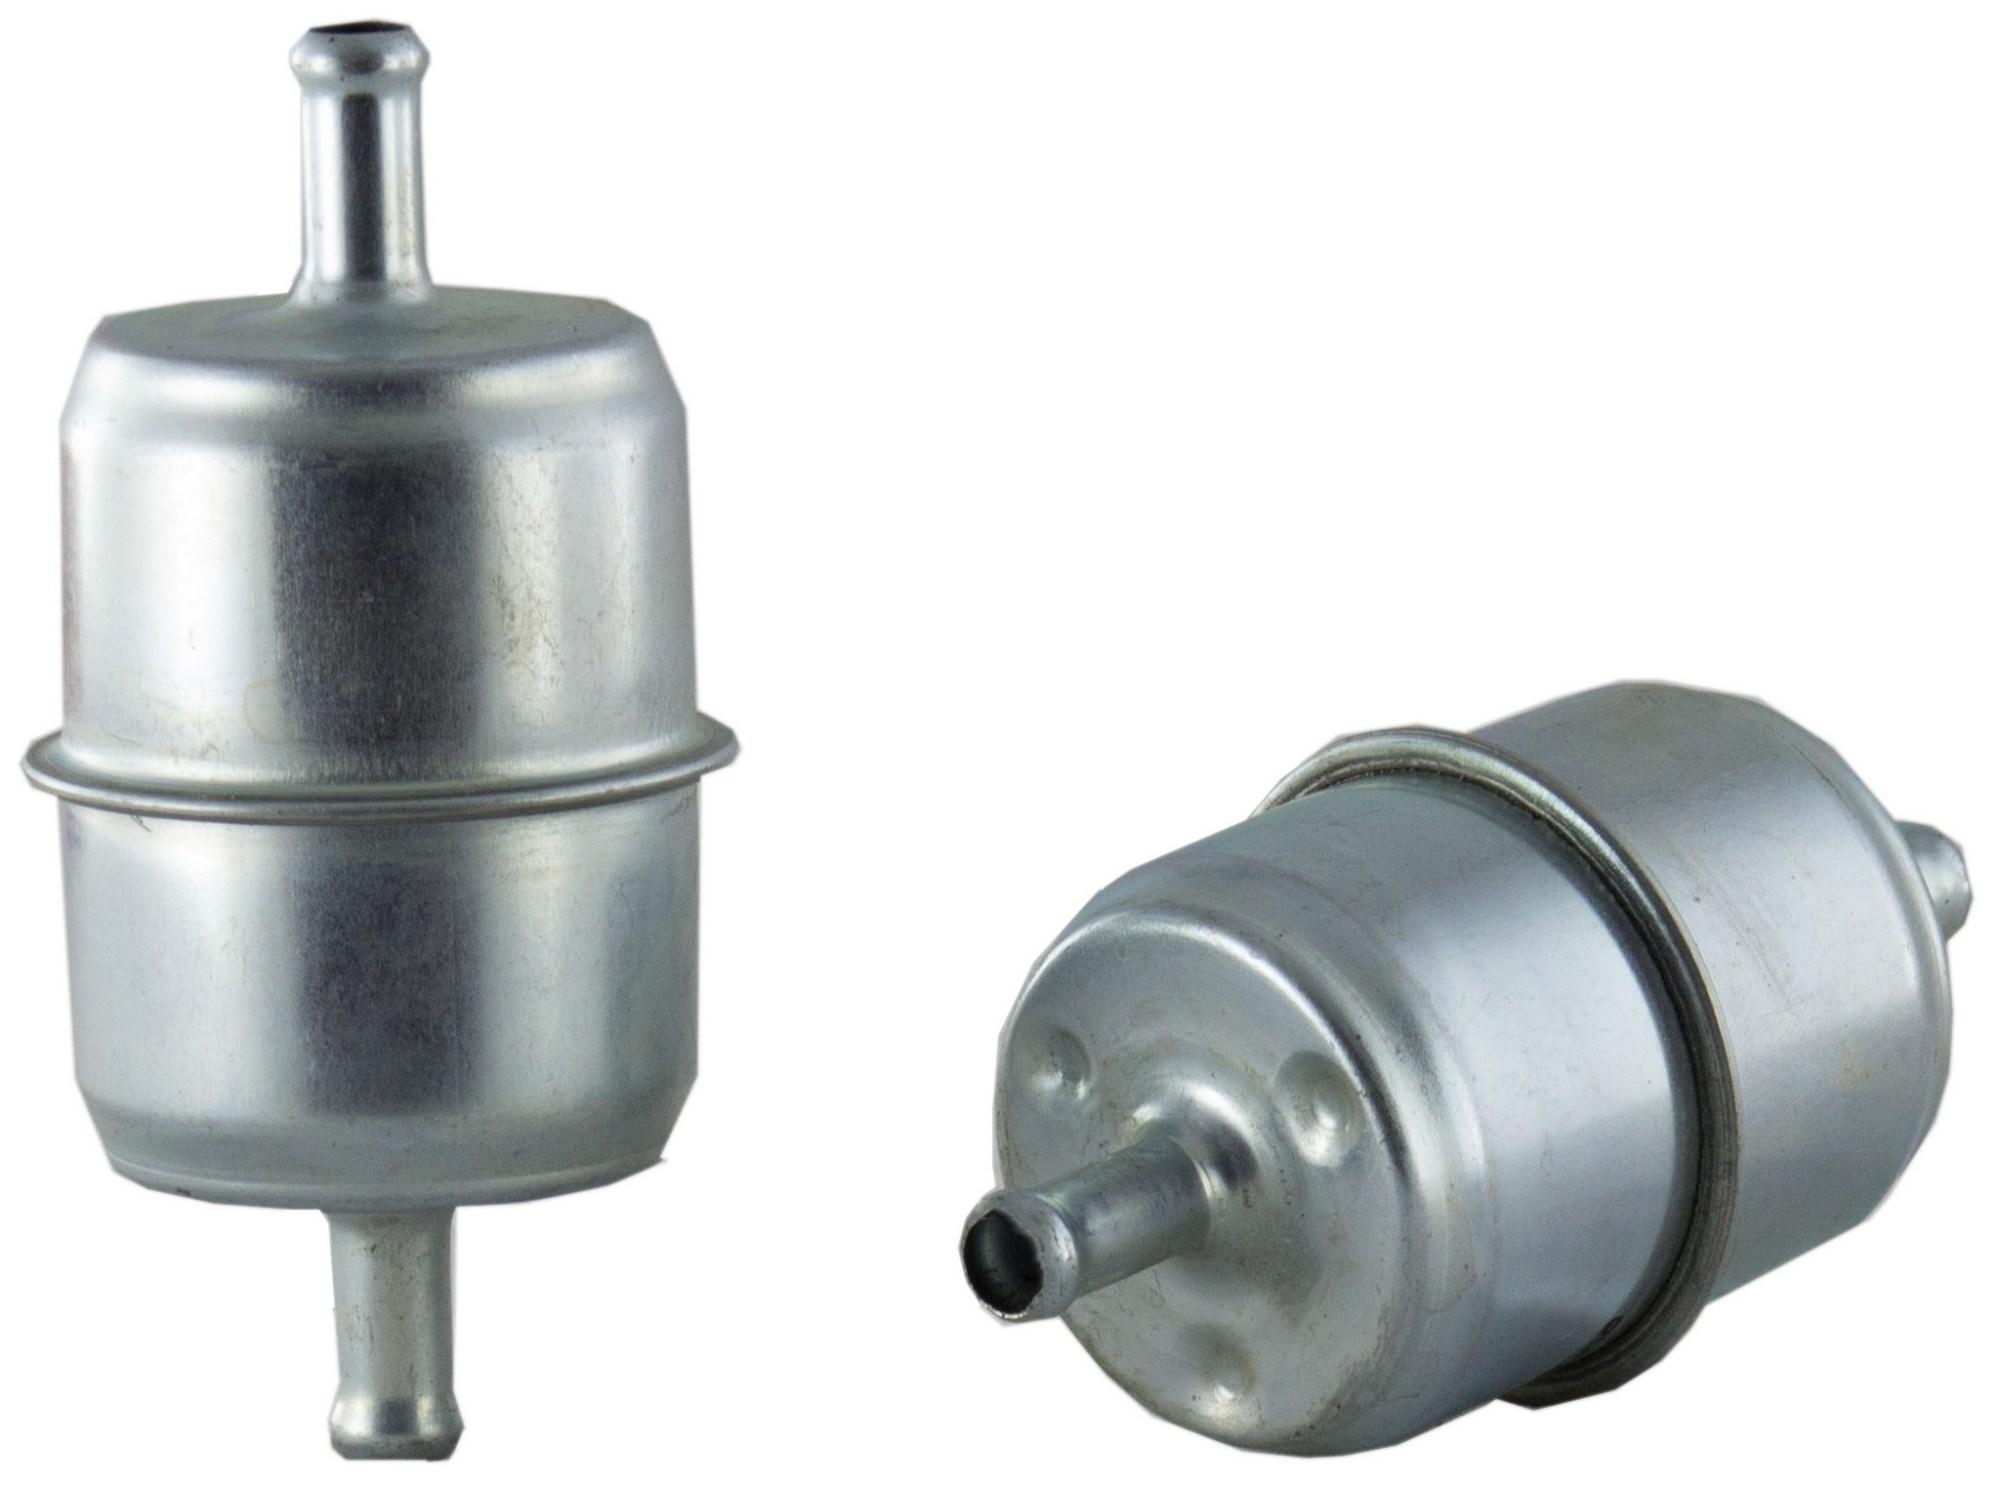 hight resolution of 1991 isuzu pickup fuel filter pg pf5 16